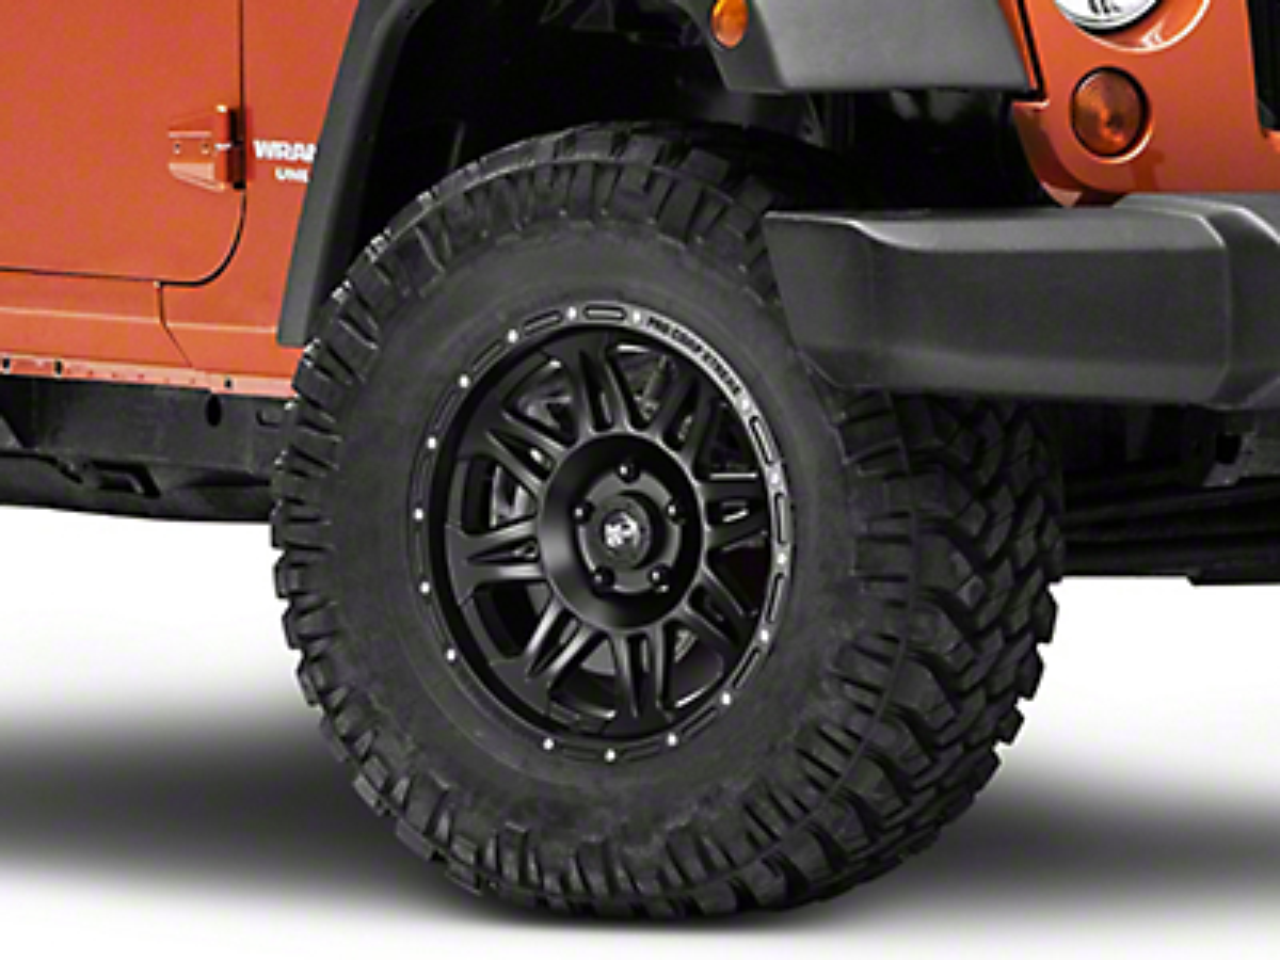 Pro Comp Series 7005 Wheel, Flat Black, 5x5 - 17x9 (07-17 Wrangler JK)